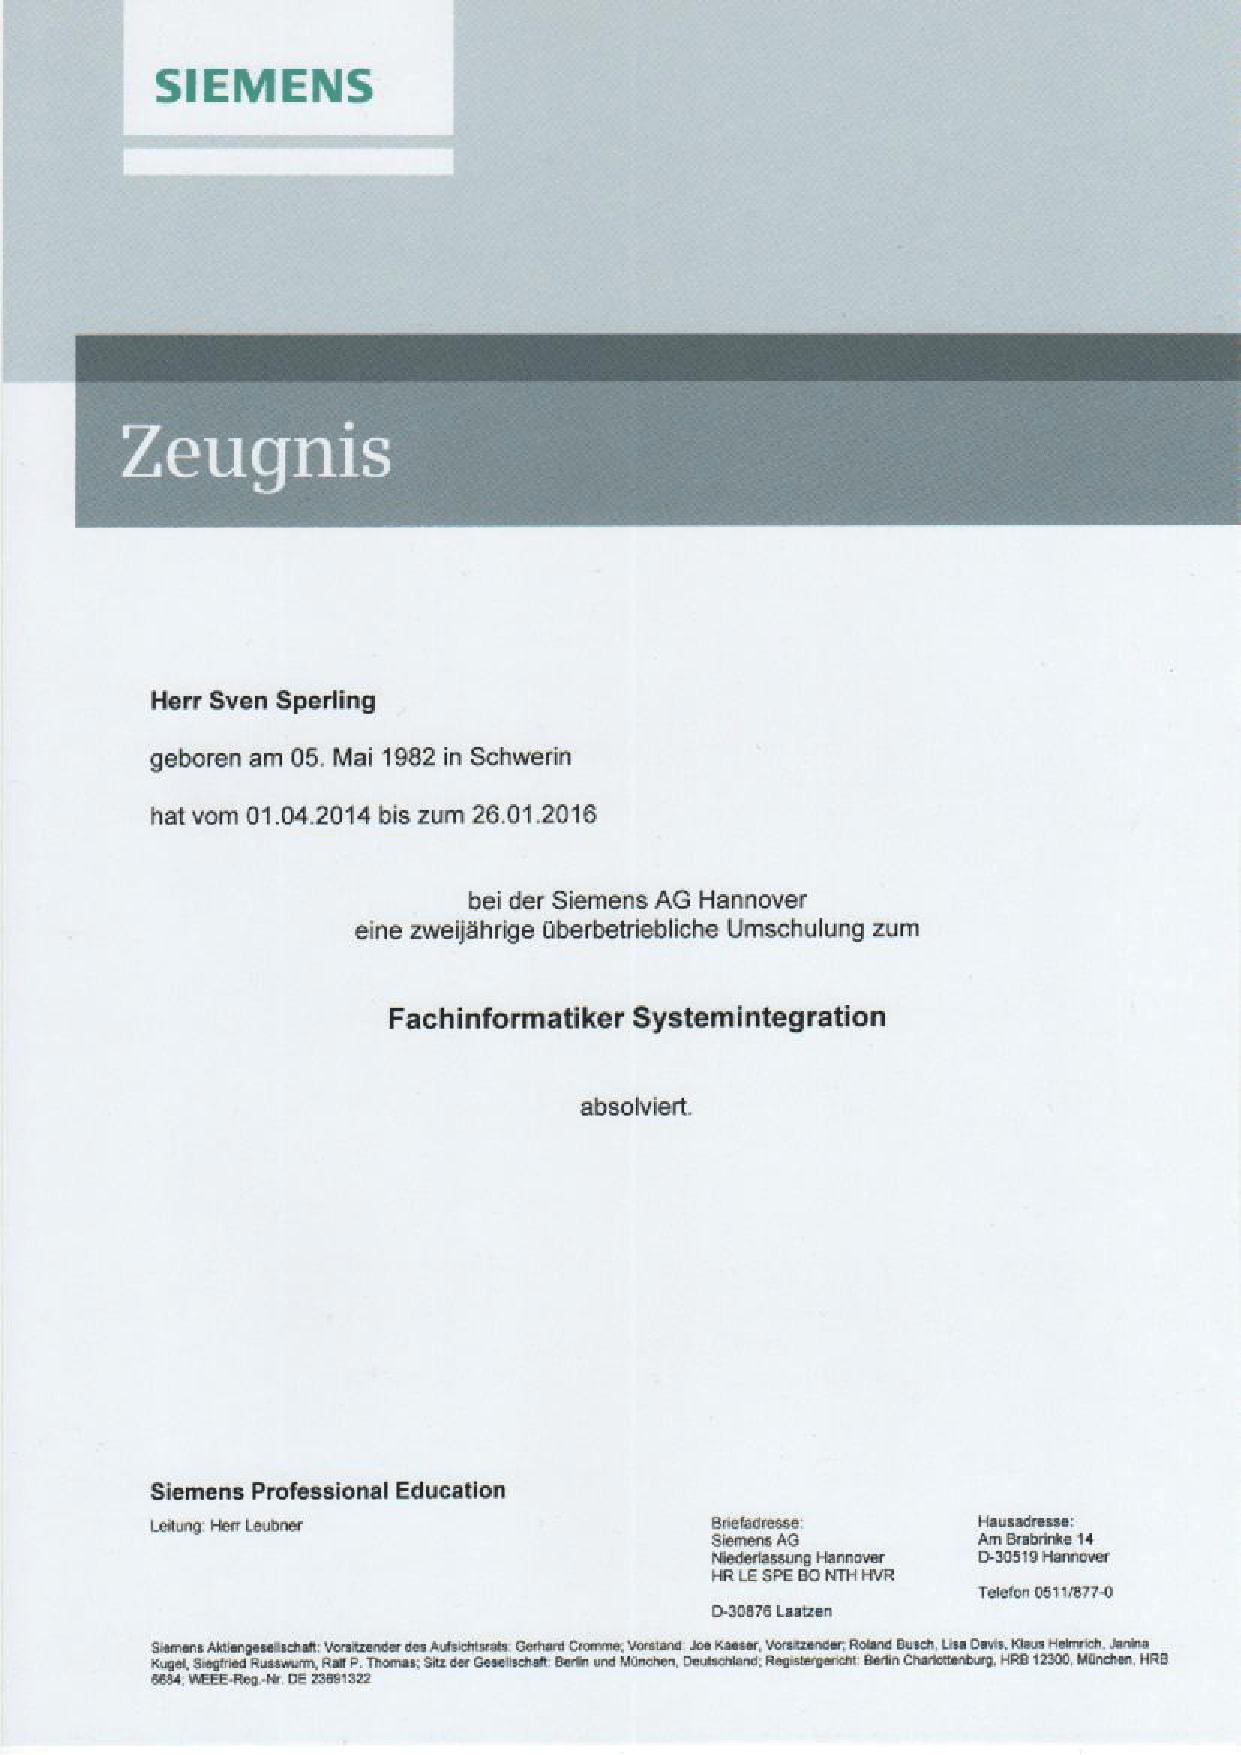 Siemens Hannover – Zeugnis – Fachinformatiker Systemintegration